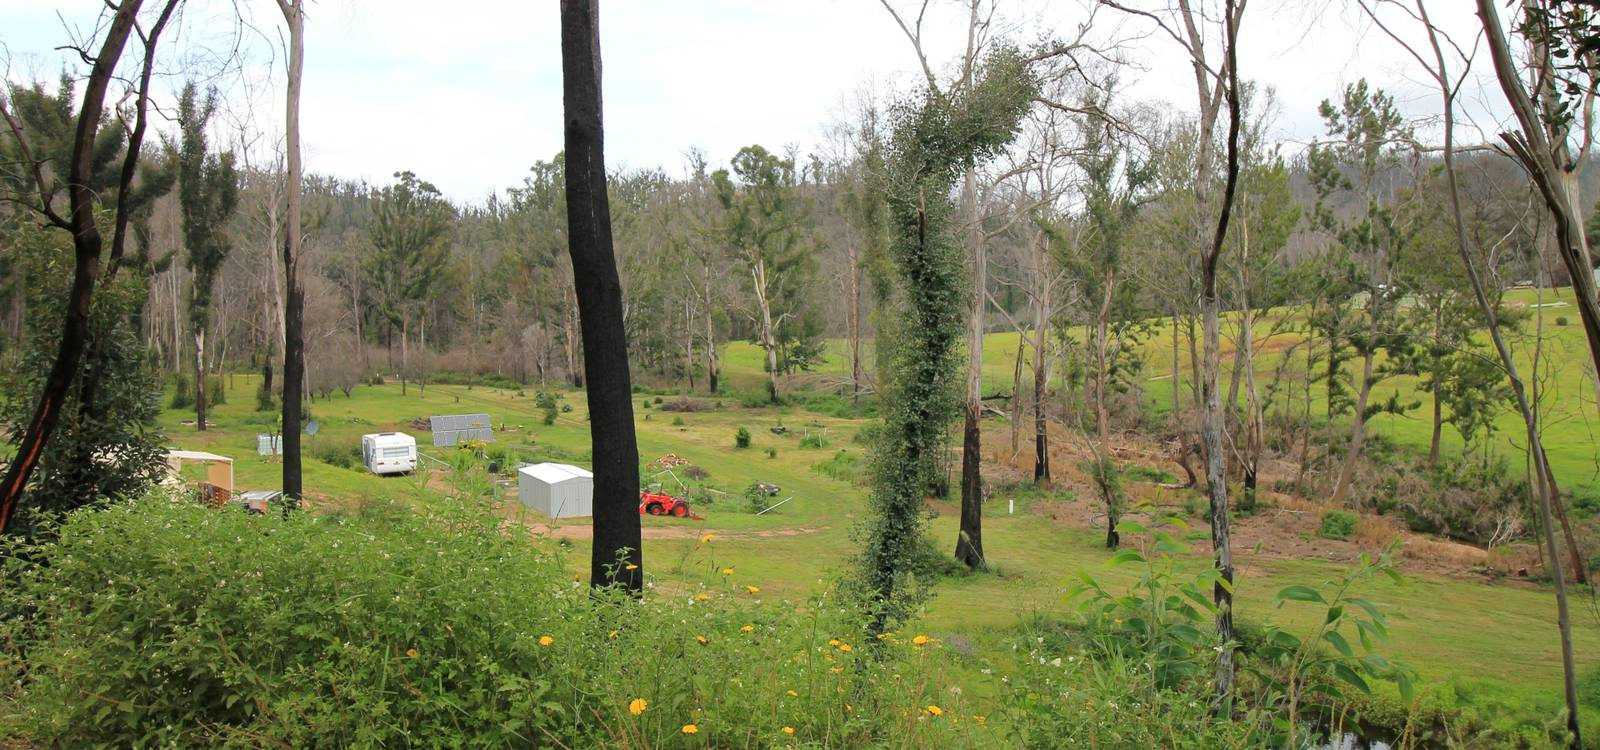 172 Reedy Creek Road EUROBODALLA, NSW 2545 - photo 1